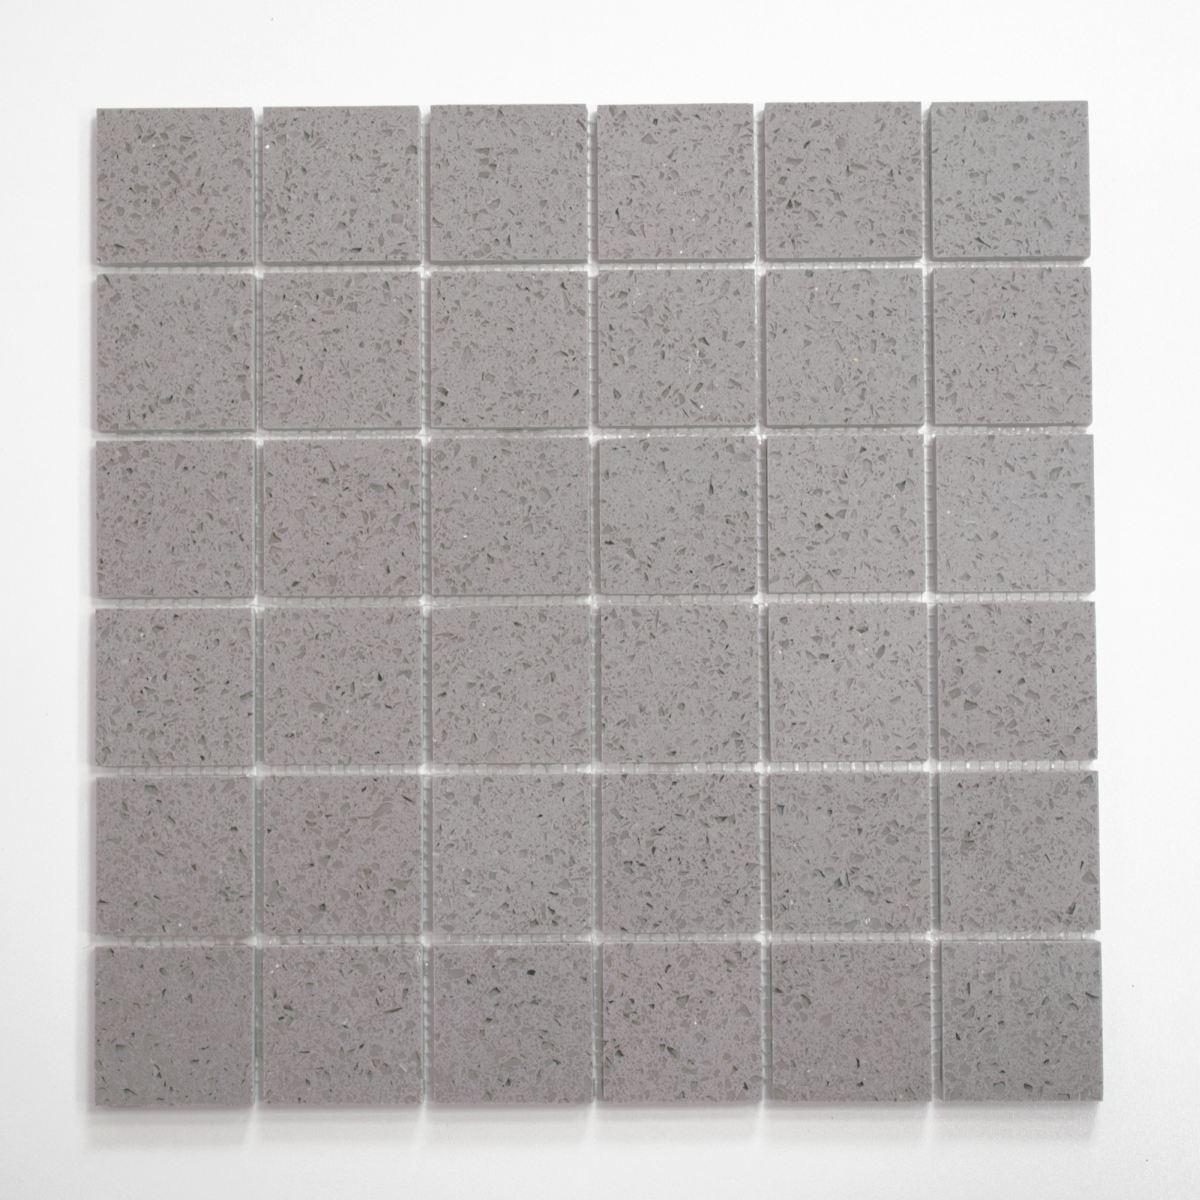 Mosaik Fliese Quarz Komposit Kunststein Artifical grau   46-ASM43_f 10Matten